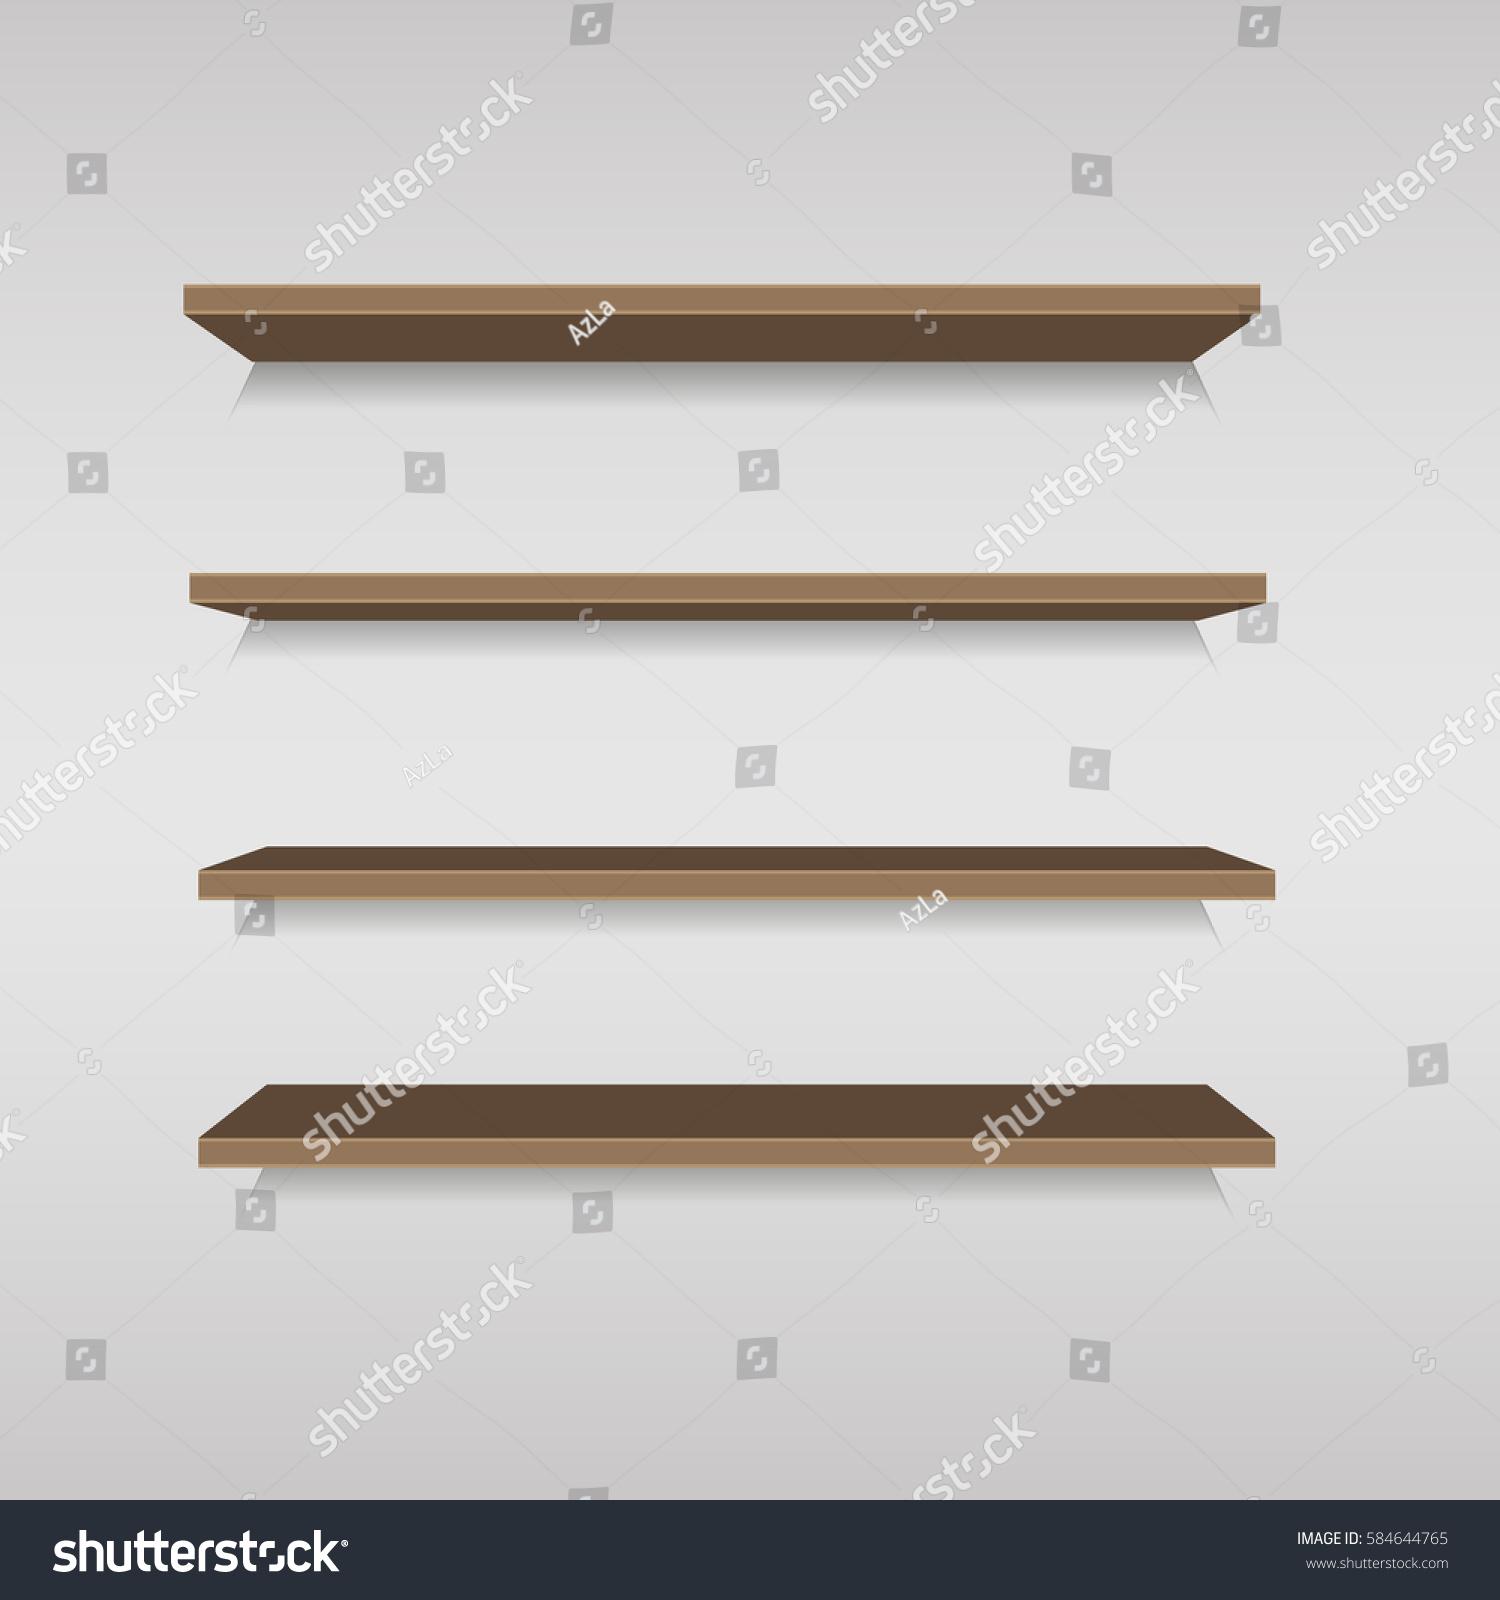 Empty Brown Shop Shelf Retail Shelves Stock Vector (Royalty Free